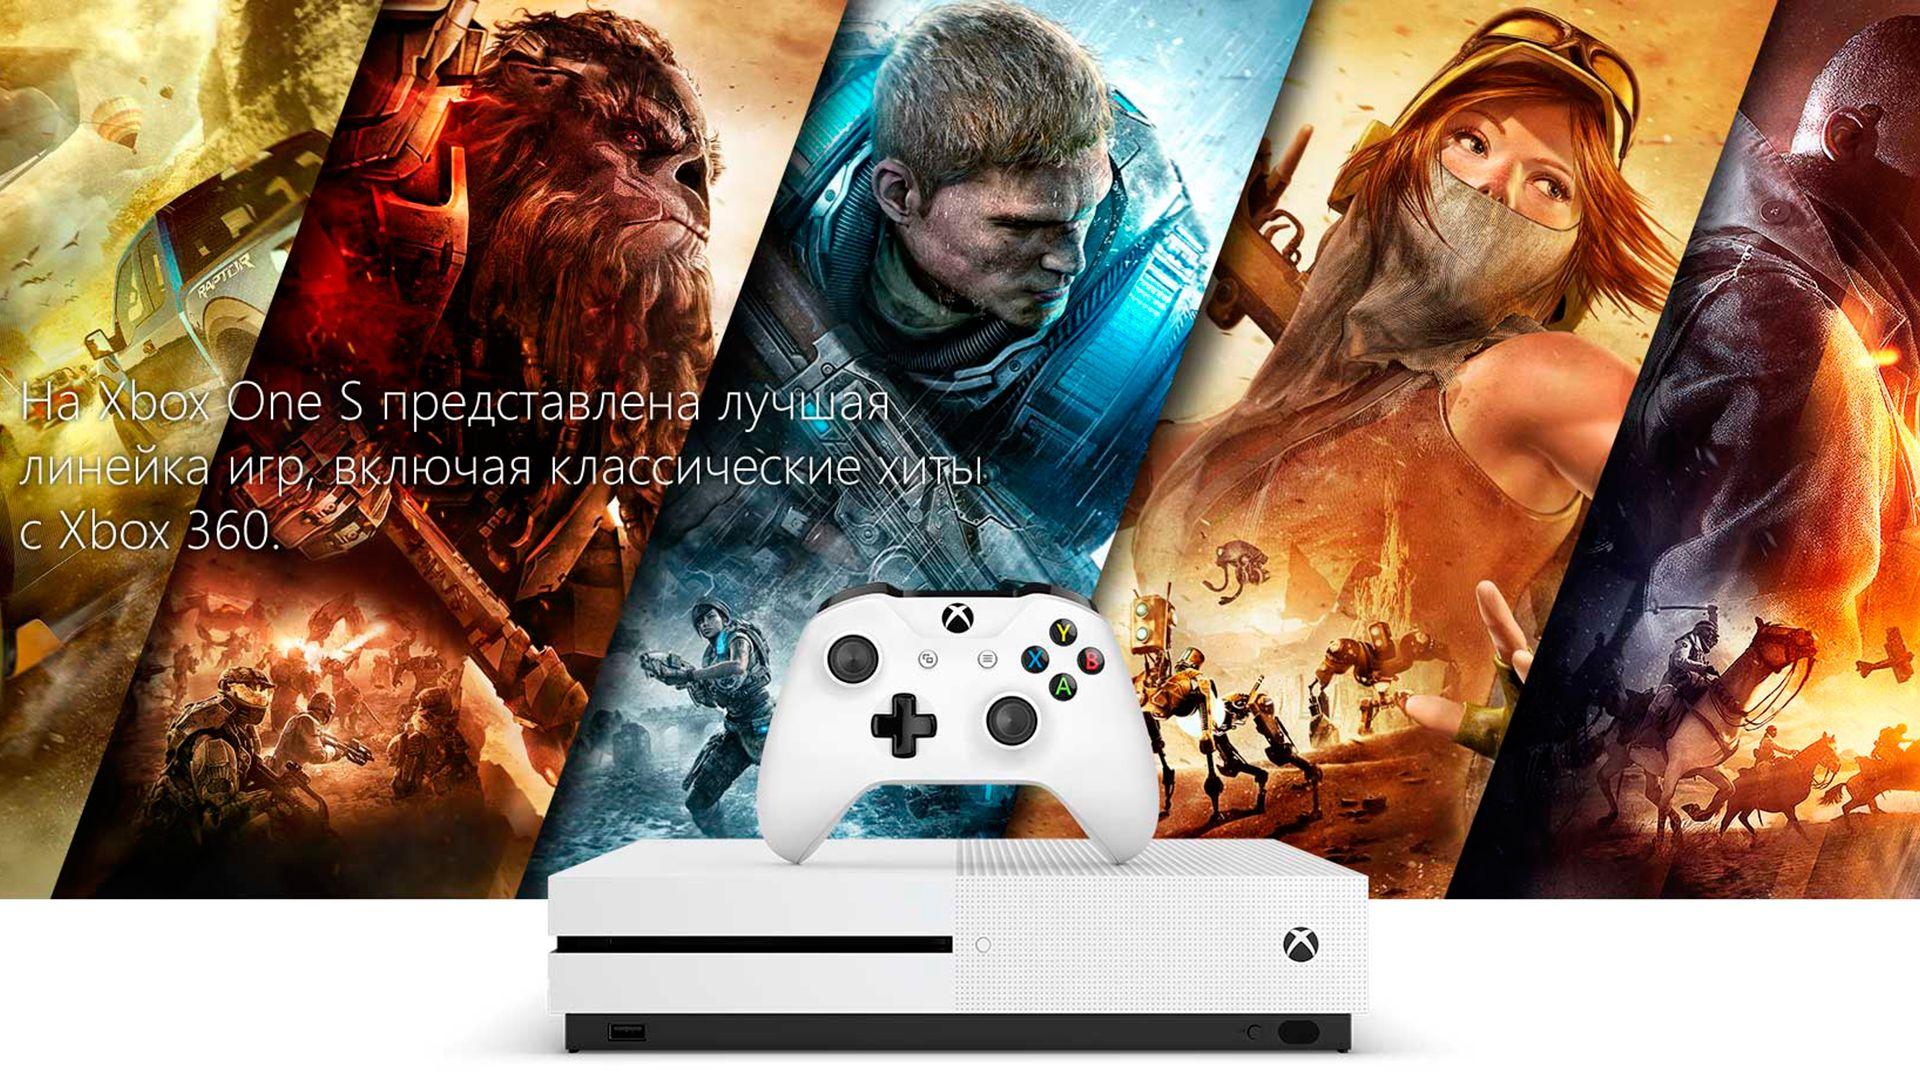 Xbox One S 500Gb FIFA 17 изображение 5